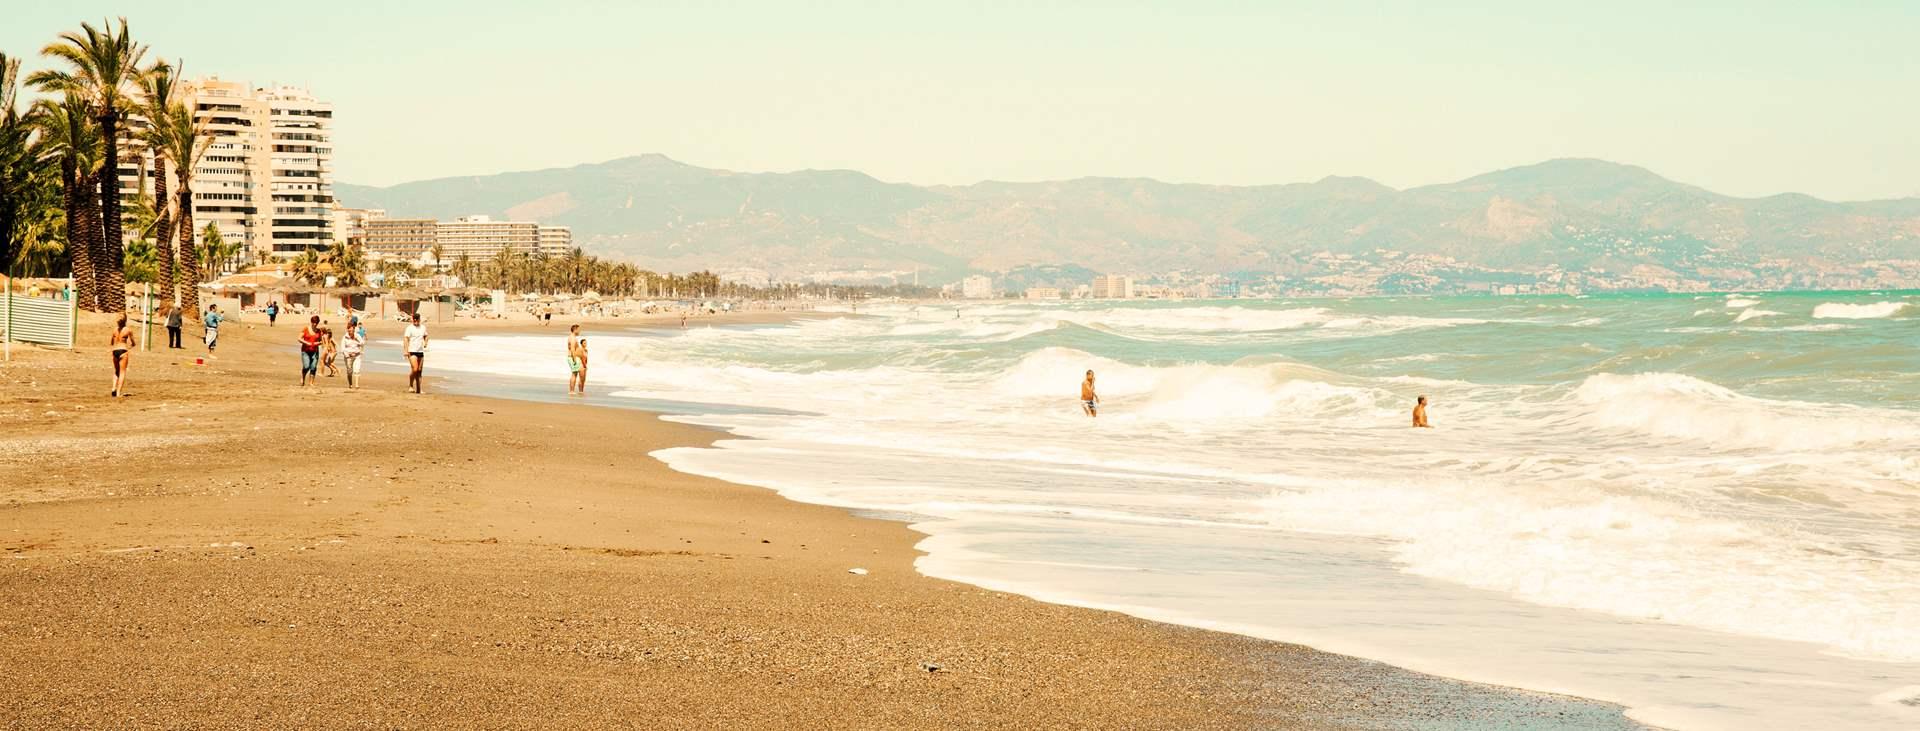 Reiser til Torremolinos på Costa del Sol i Spania